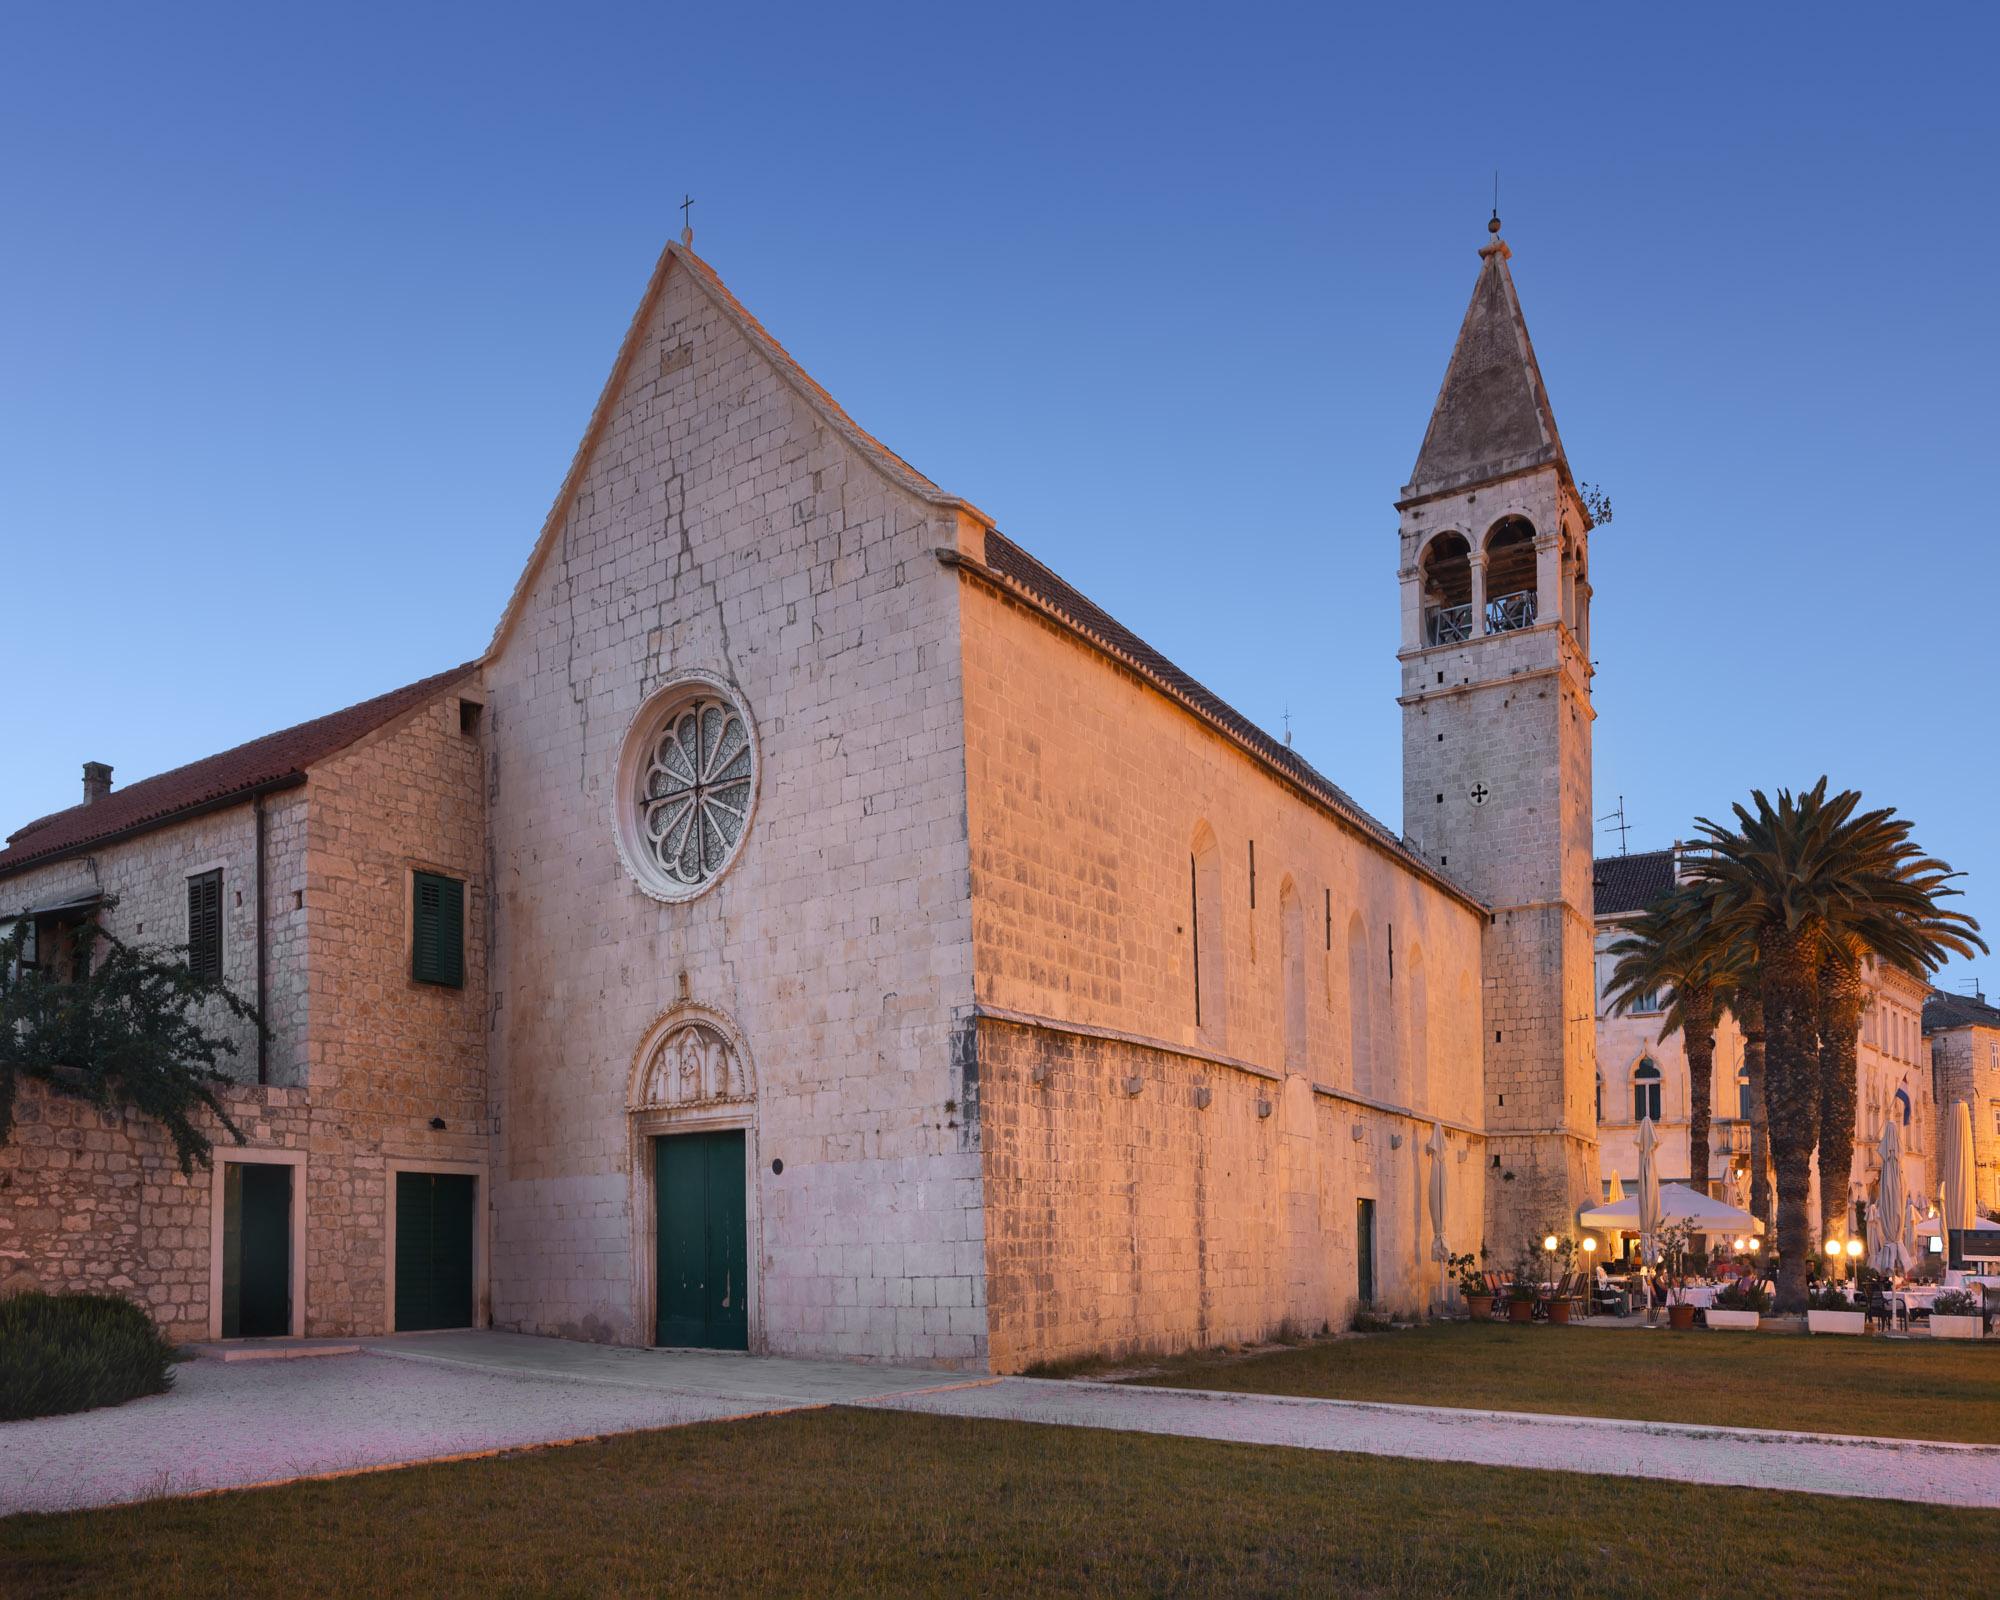 Church of Saint Dominic in Trogir, Croatia